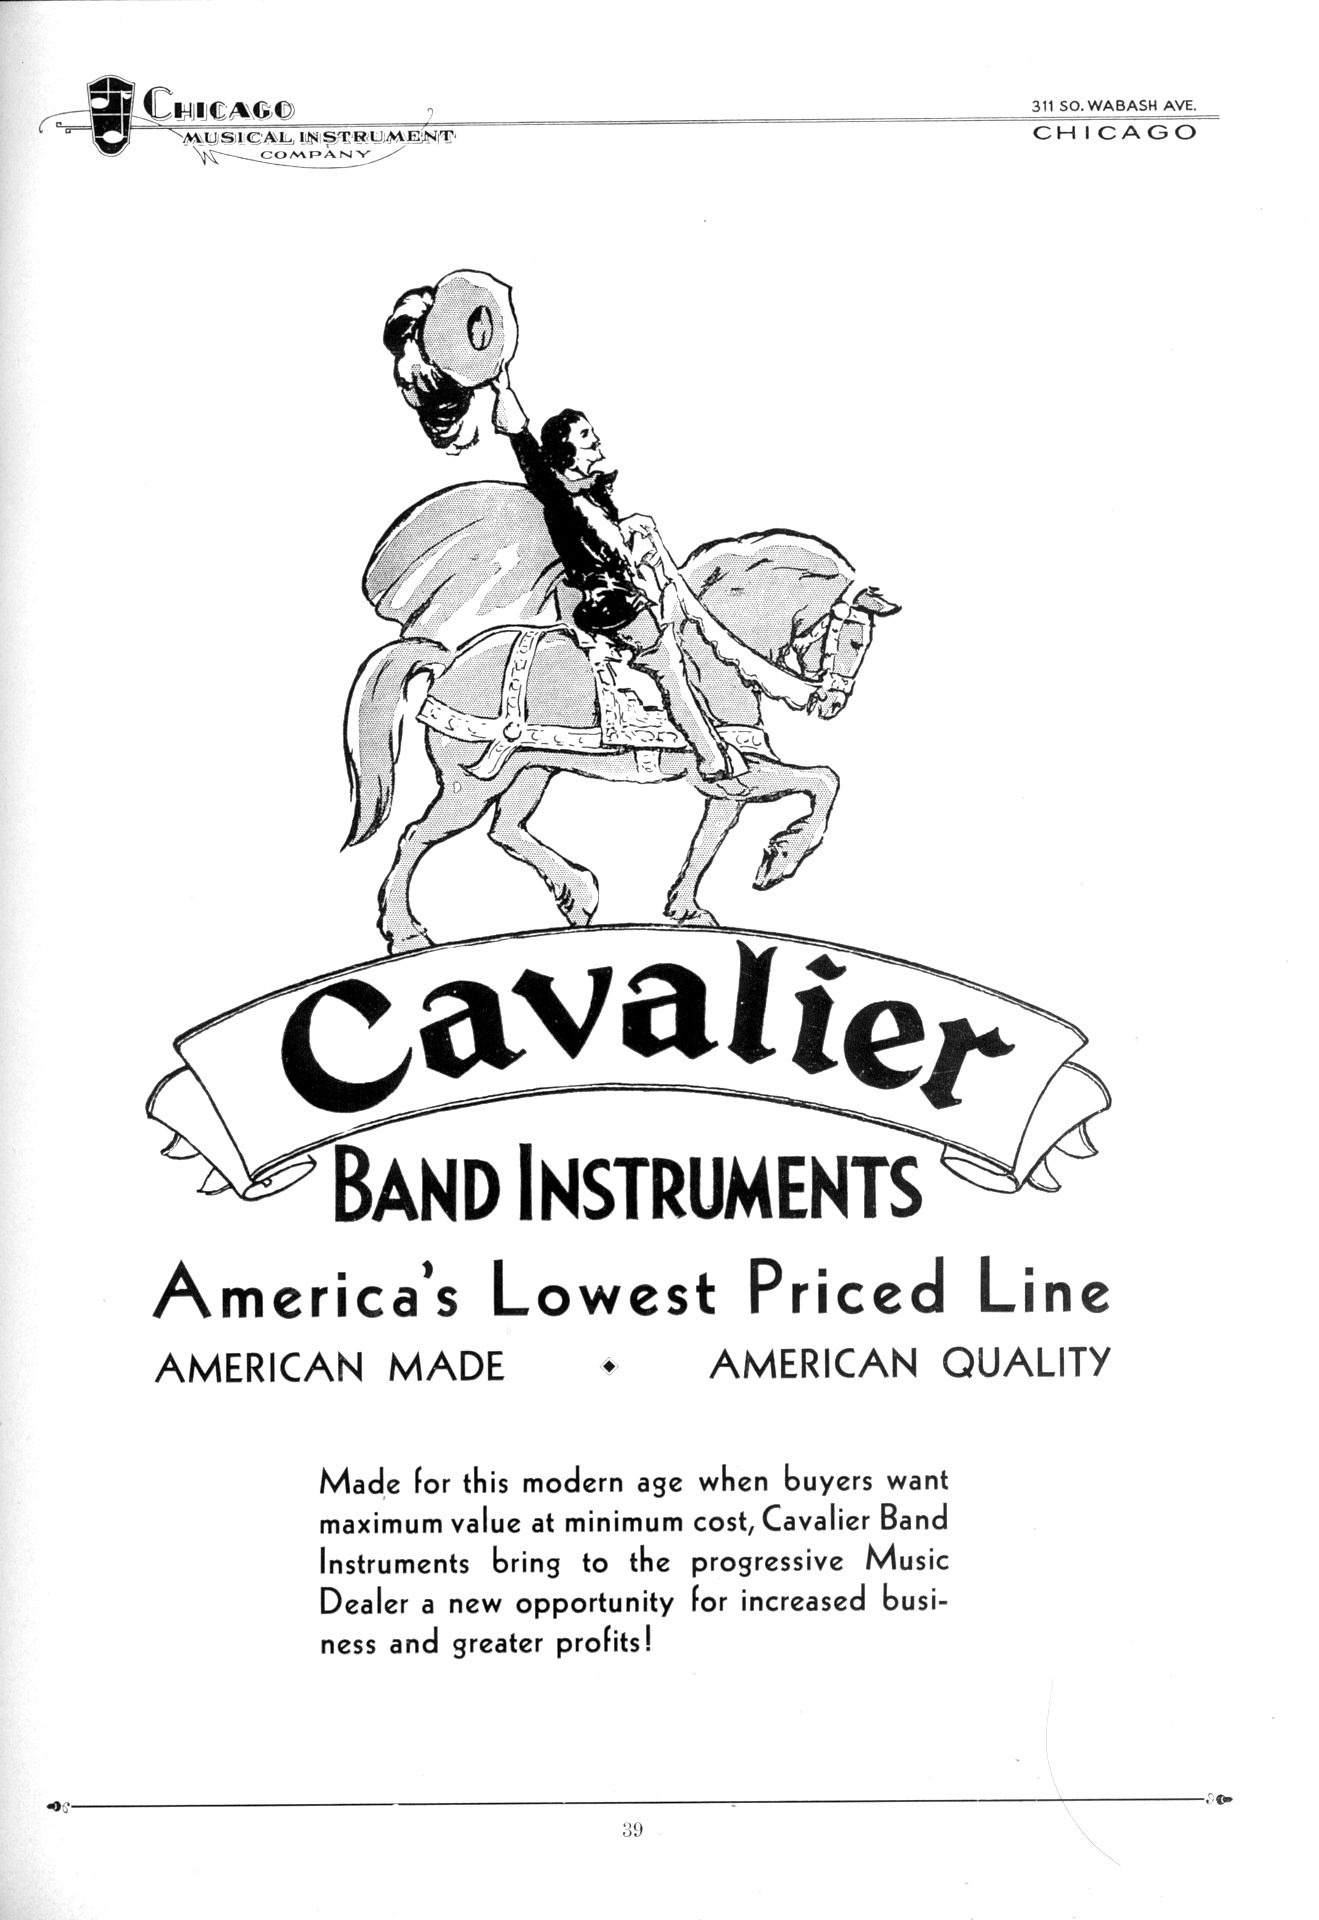 Cavalier Saxophones | The Bassic Sax Blog